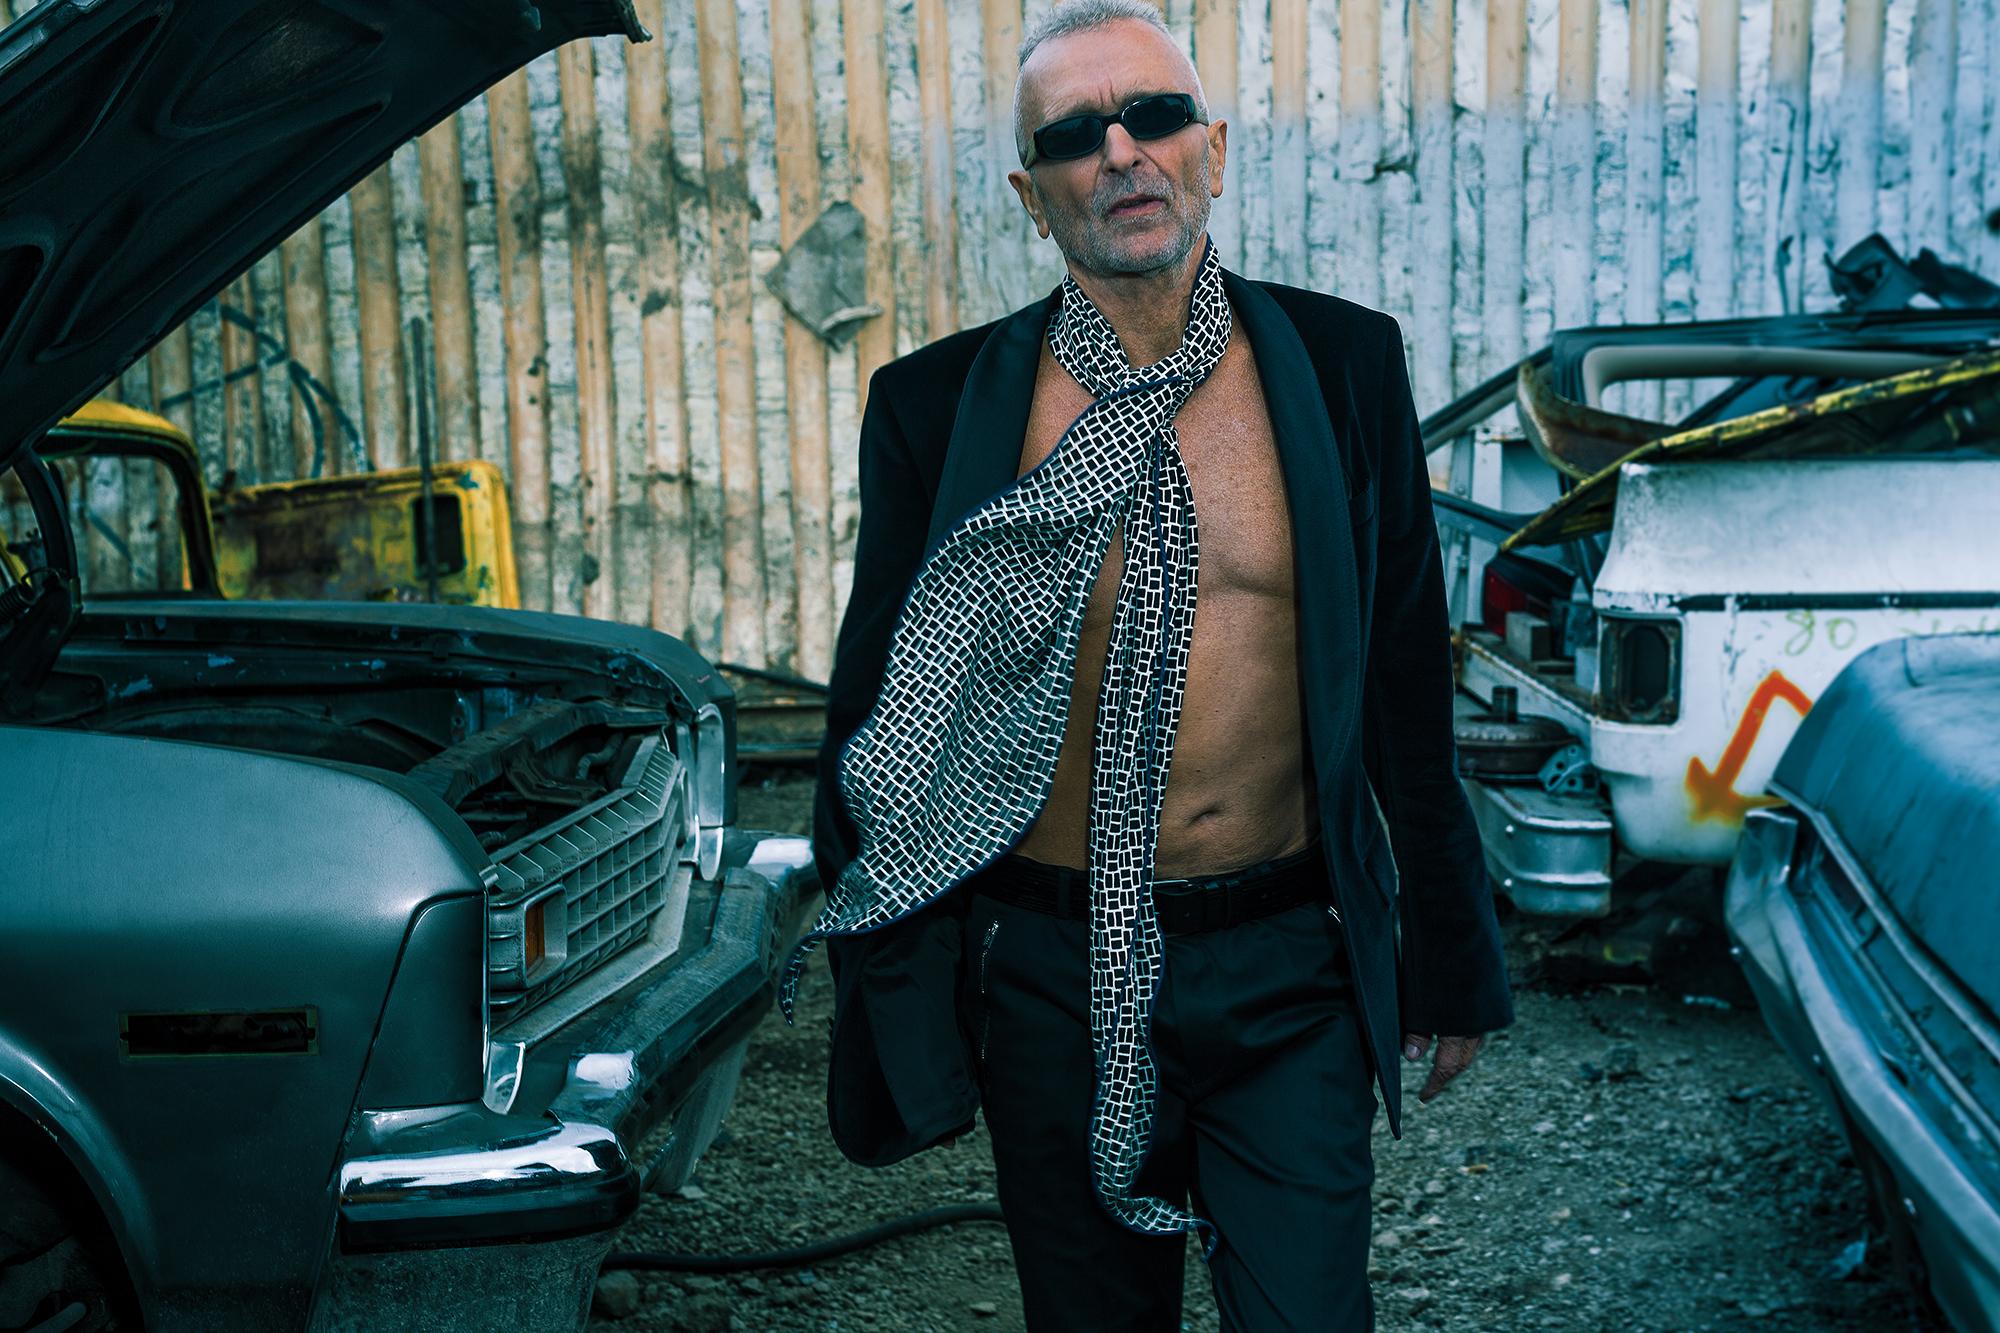 Sunglasses MONTY'S OWN. Scarf HERMÈS. Suit HUGO BOSS. Belt JIMMY CHOO.